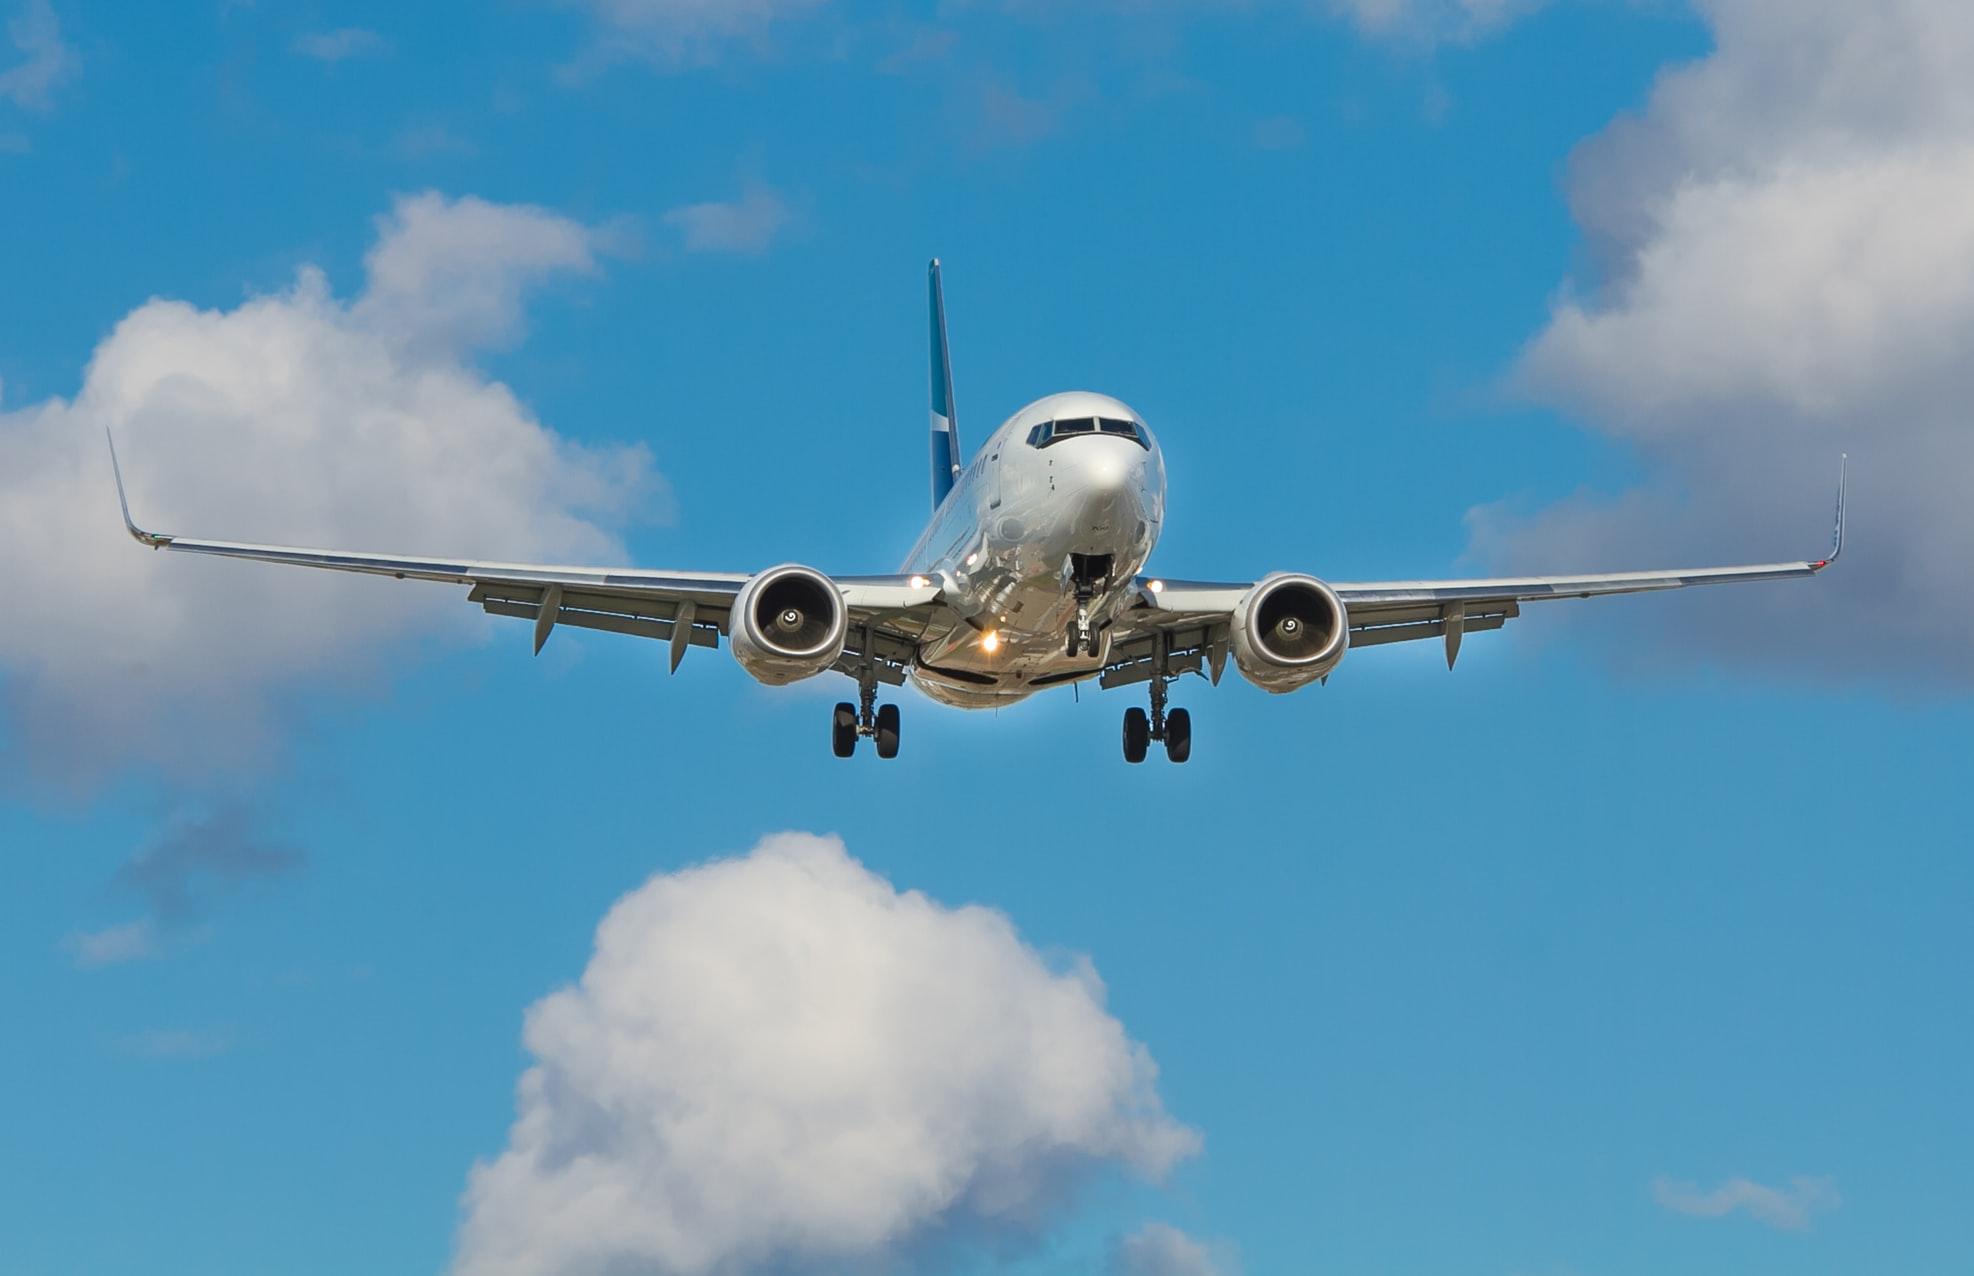 WestJet Airplane in the sky